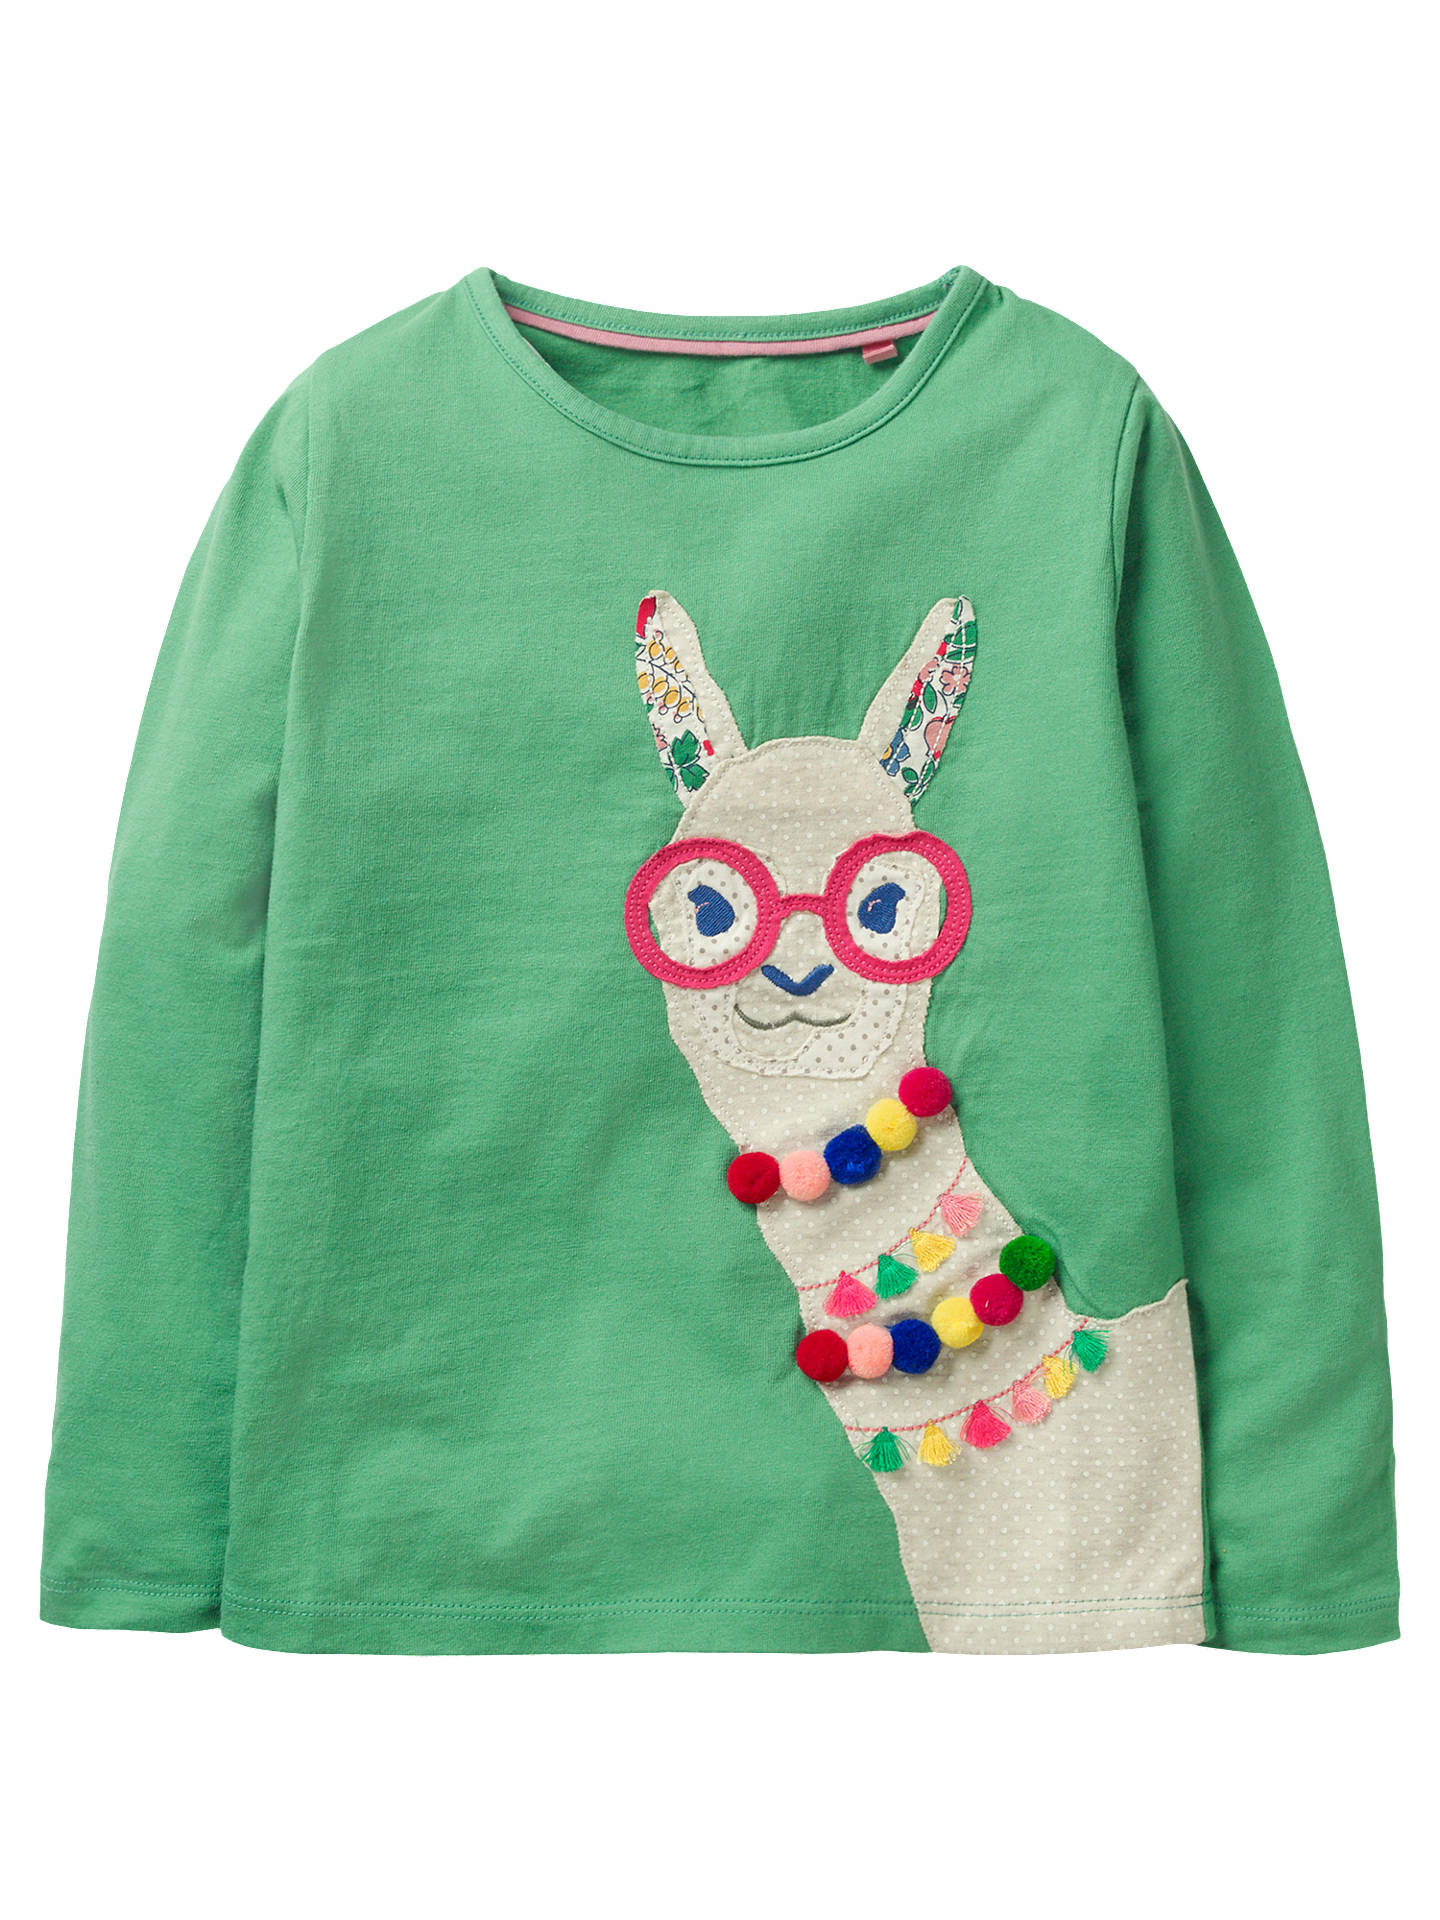 944f93b1bef4cd Mini Boden Girls' Applique Llama T-Shirt, Green at John Lewis & Partners